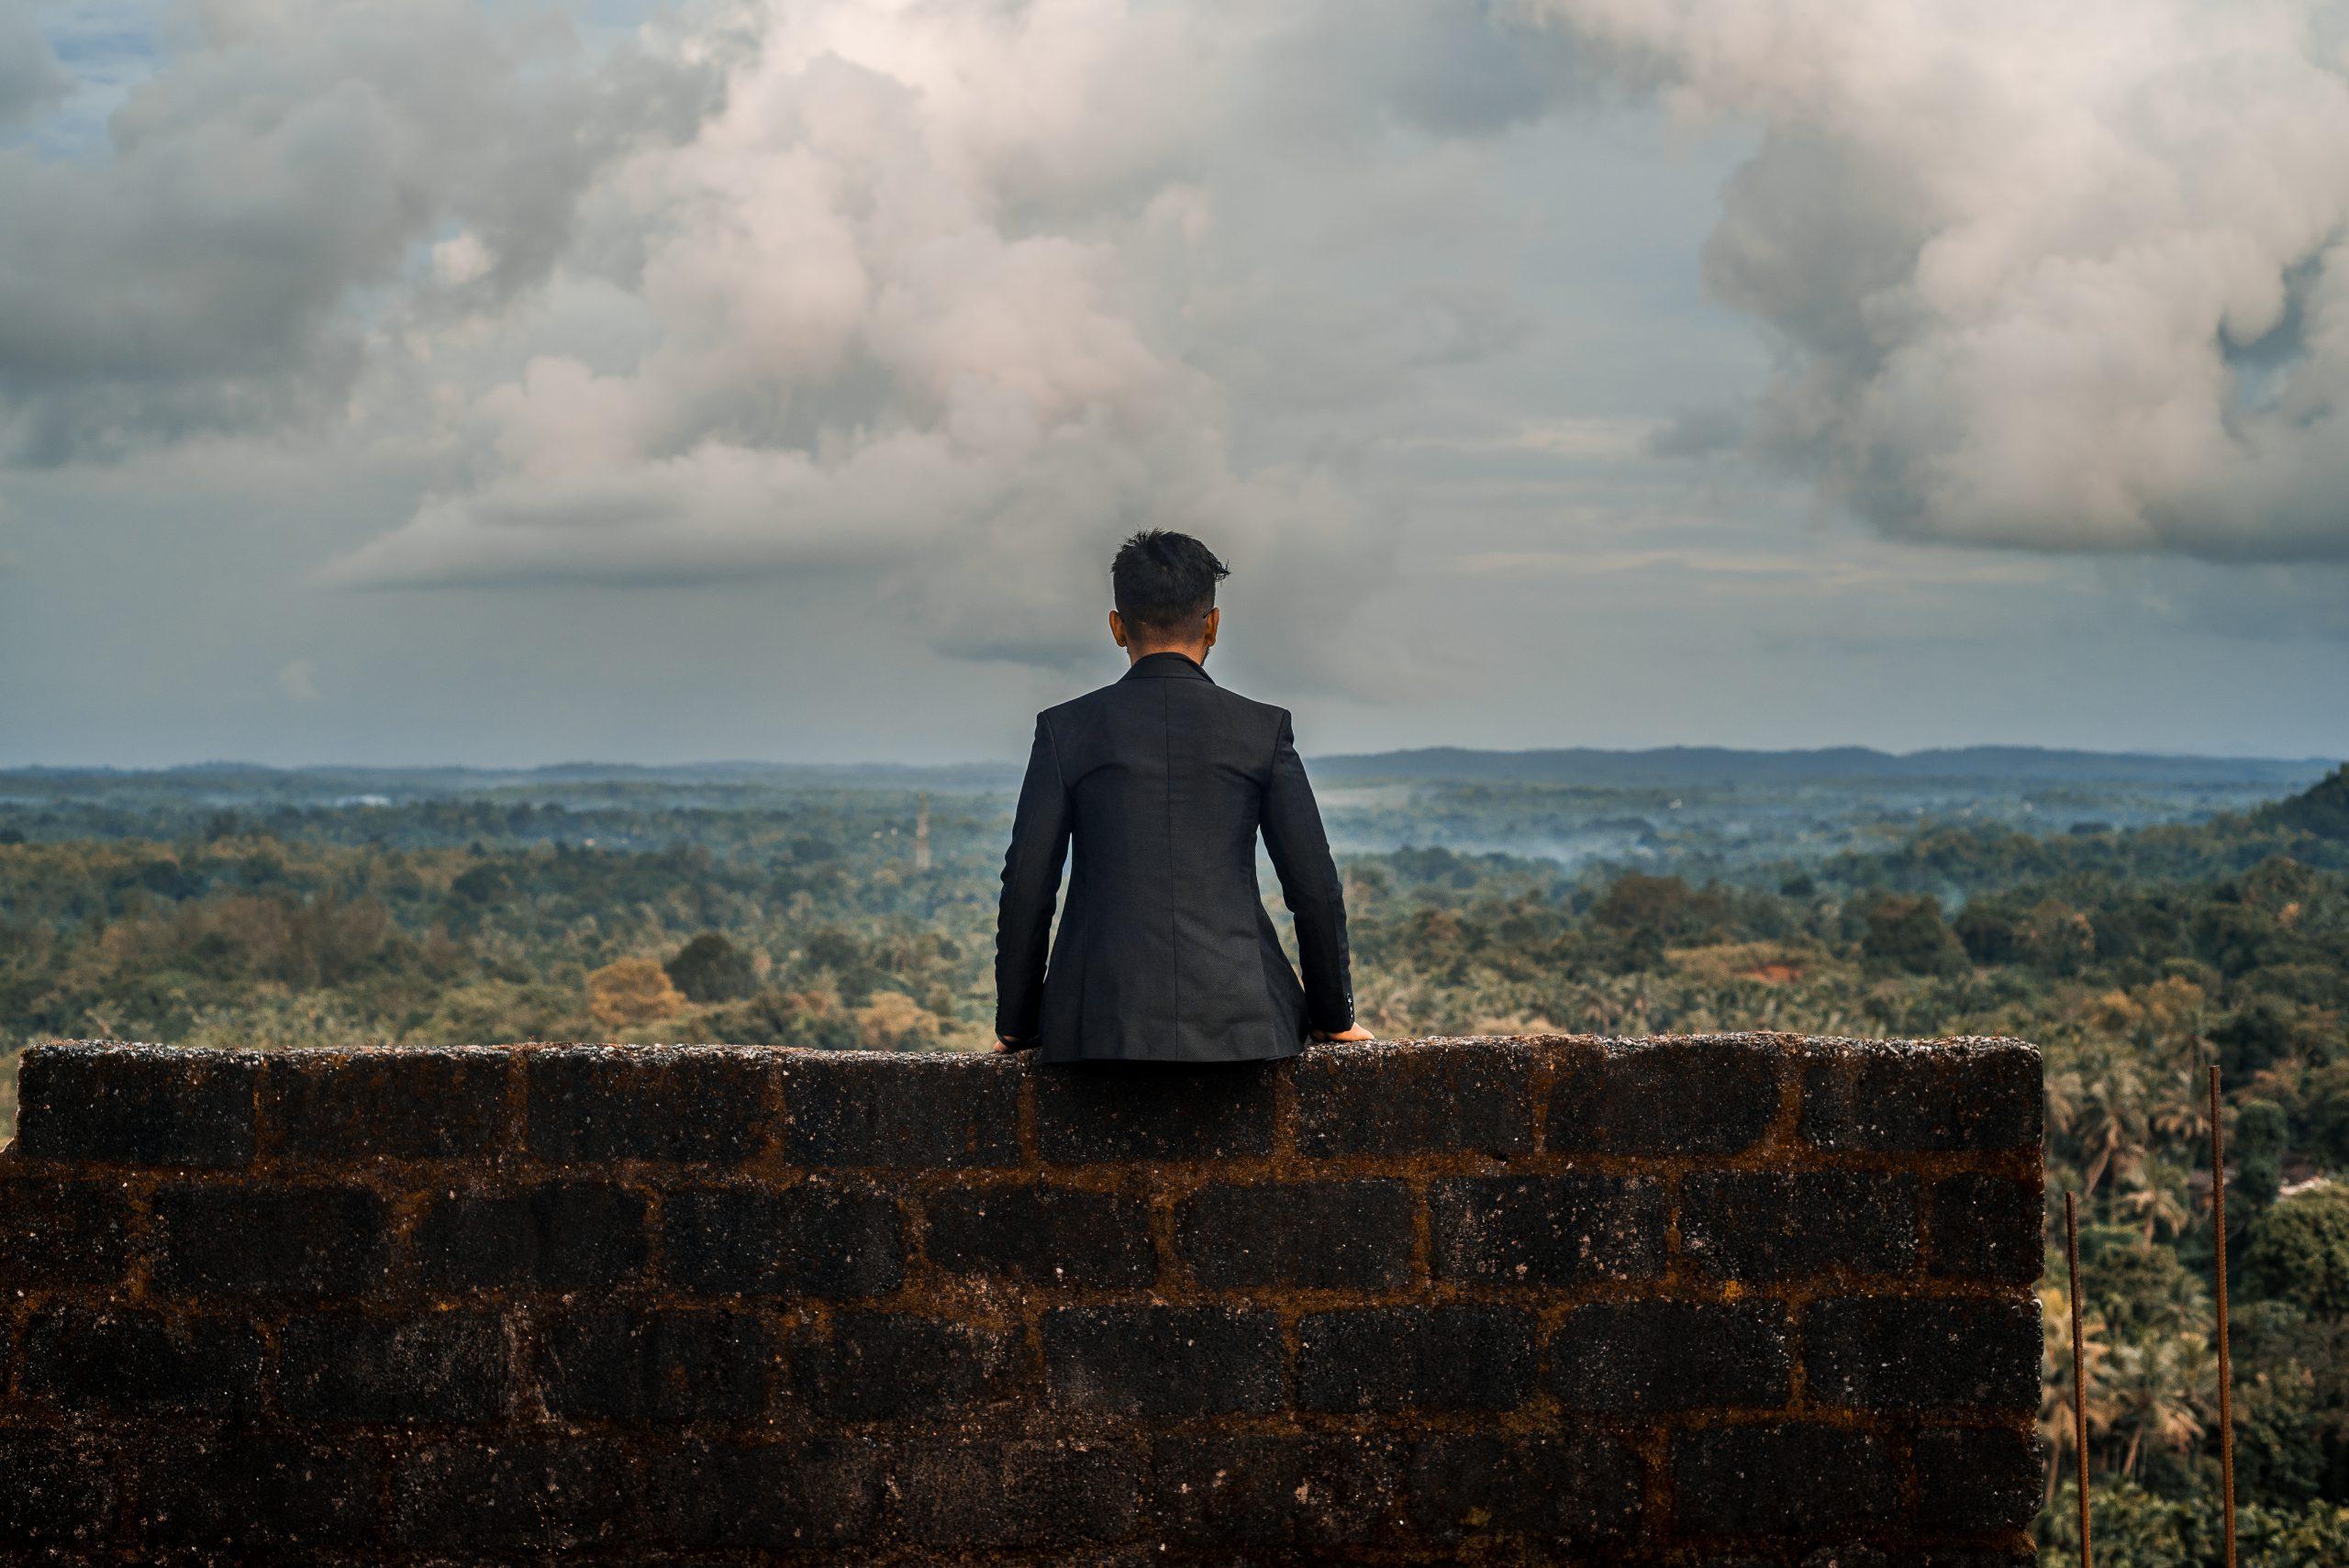 A boy sit on a top